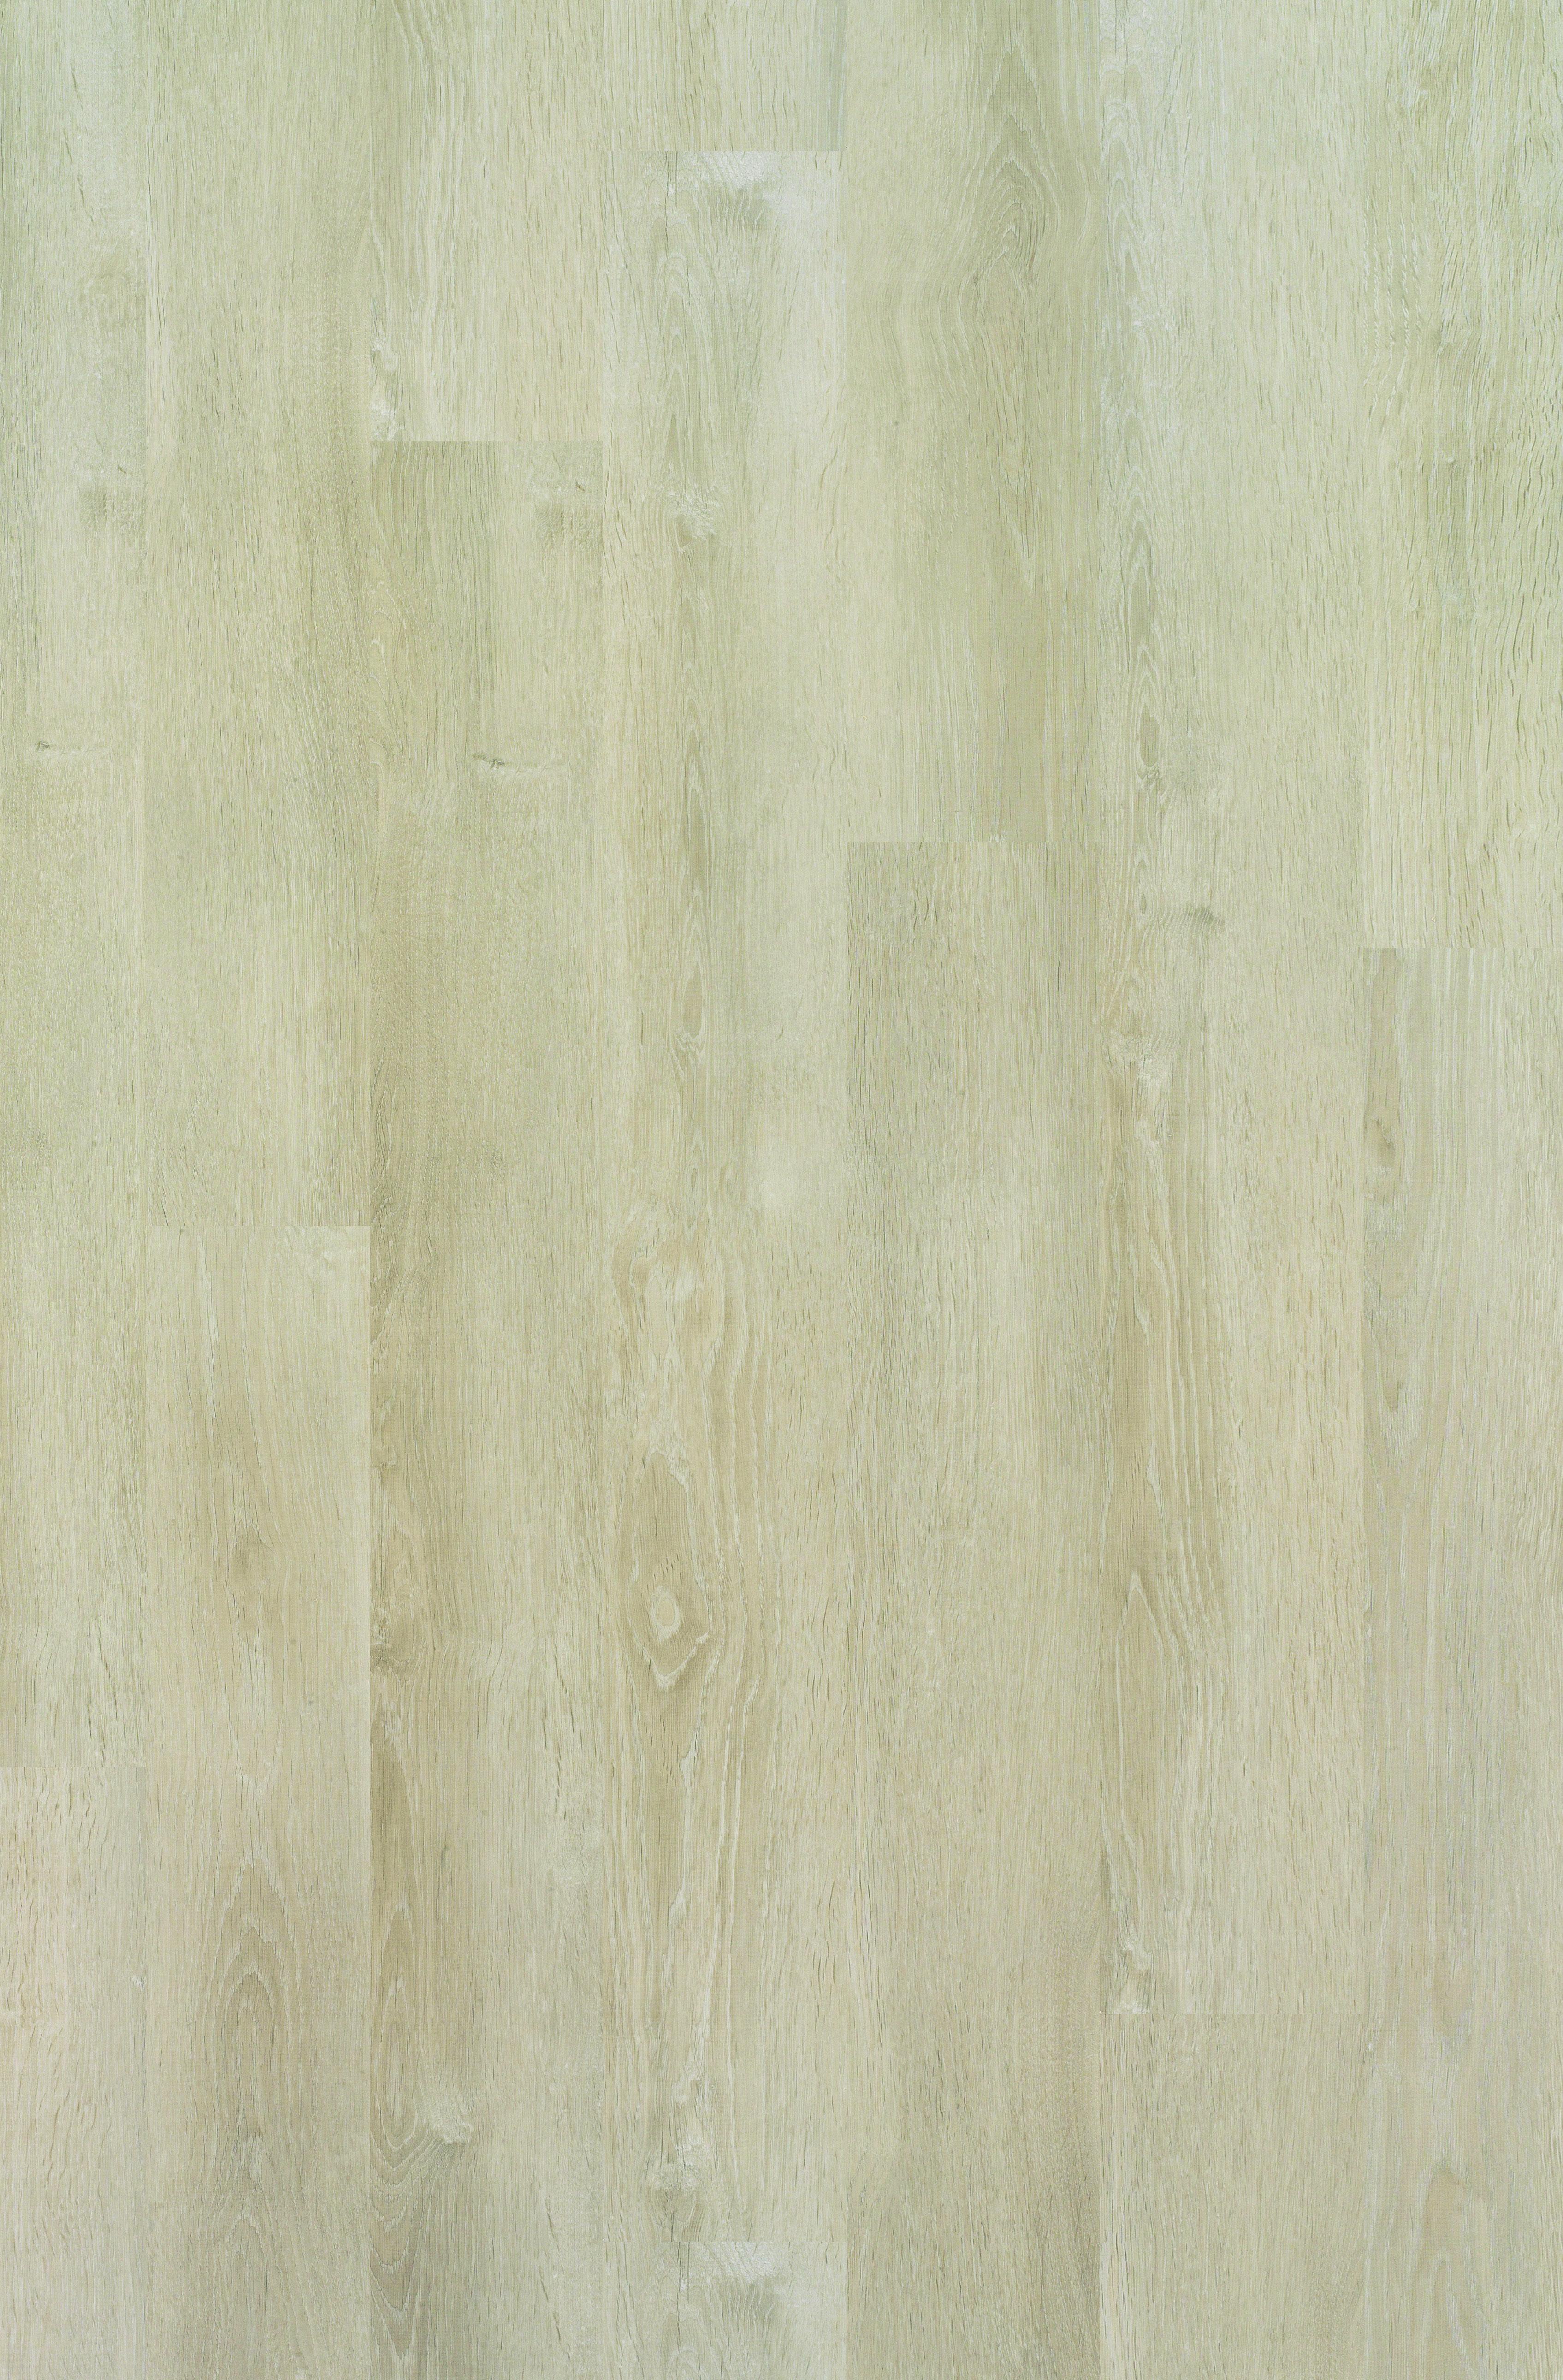 laminat berry alloc urban vanille eiche woodi24. Black Bedroom Furniture Sets. Home Design Ideas